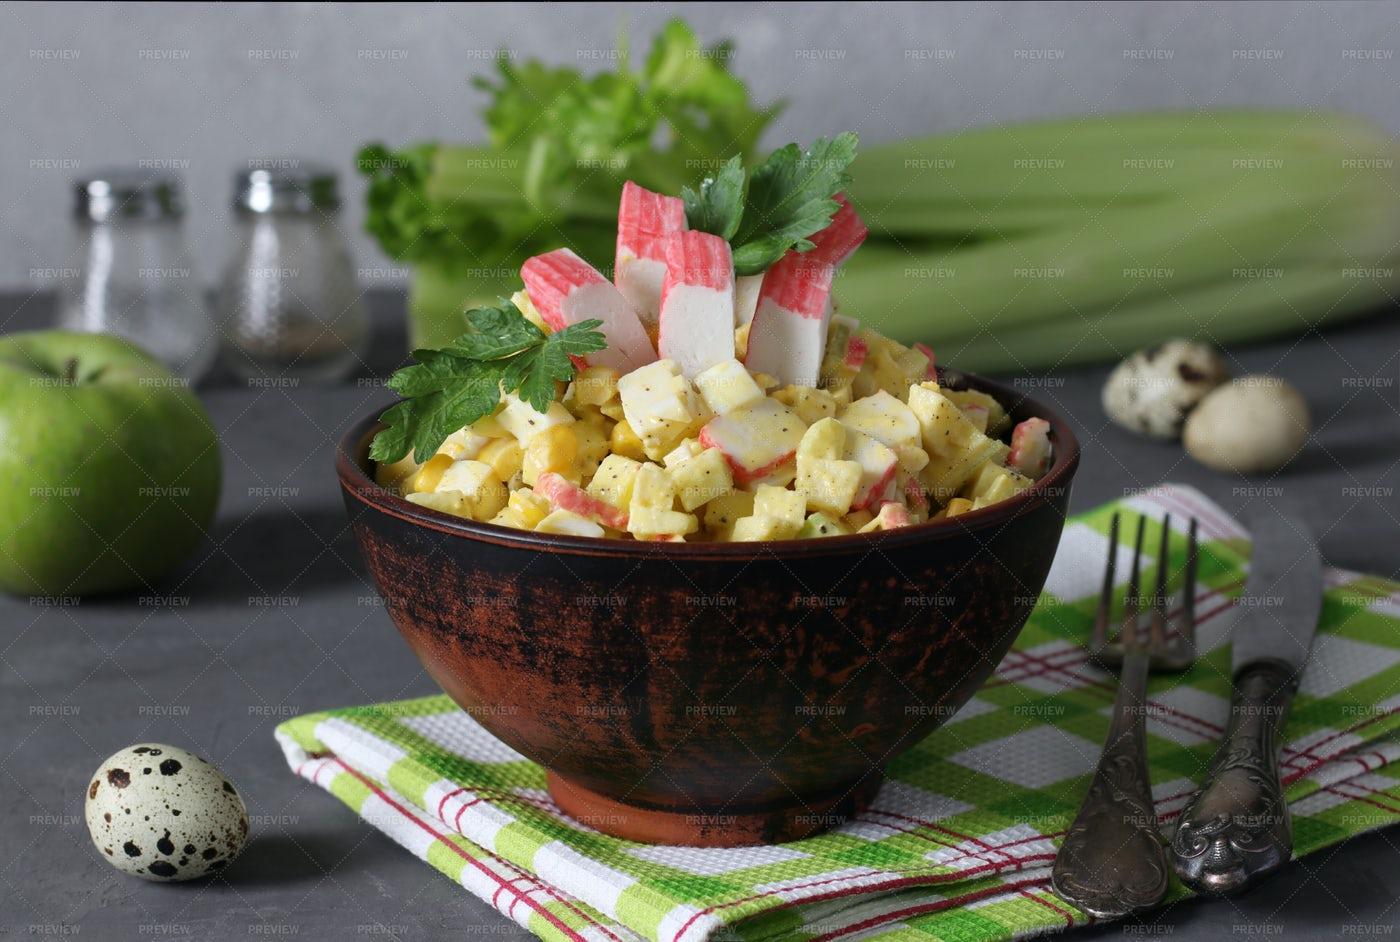 Salad With Crab Sticks And Celery: Stock Photos